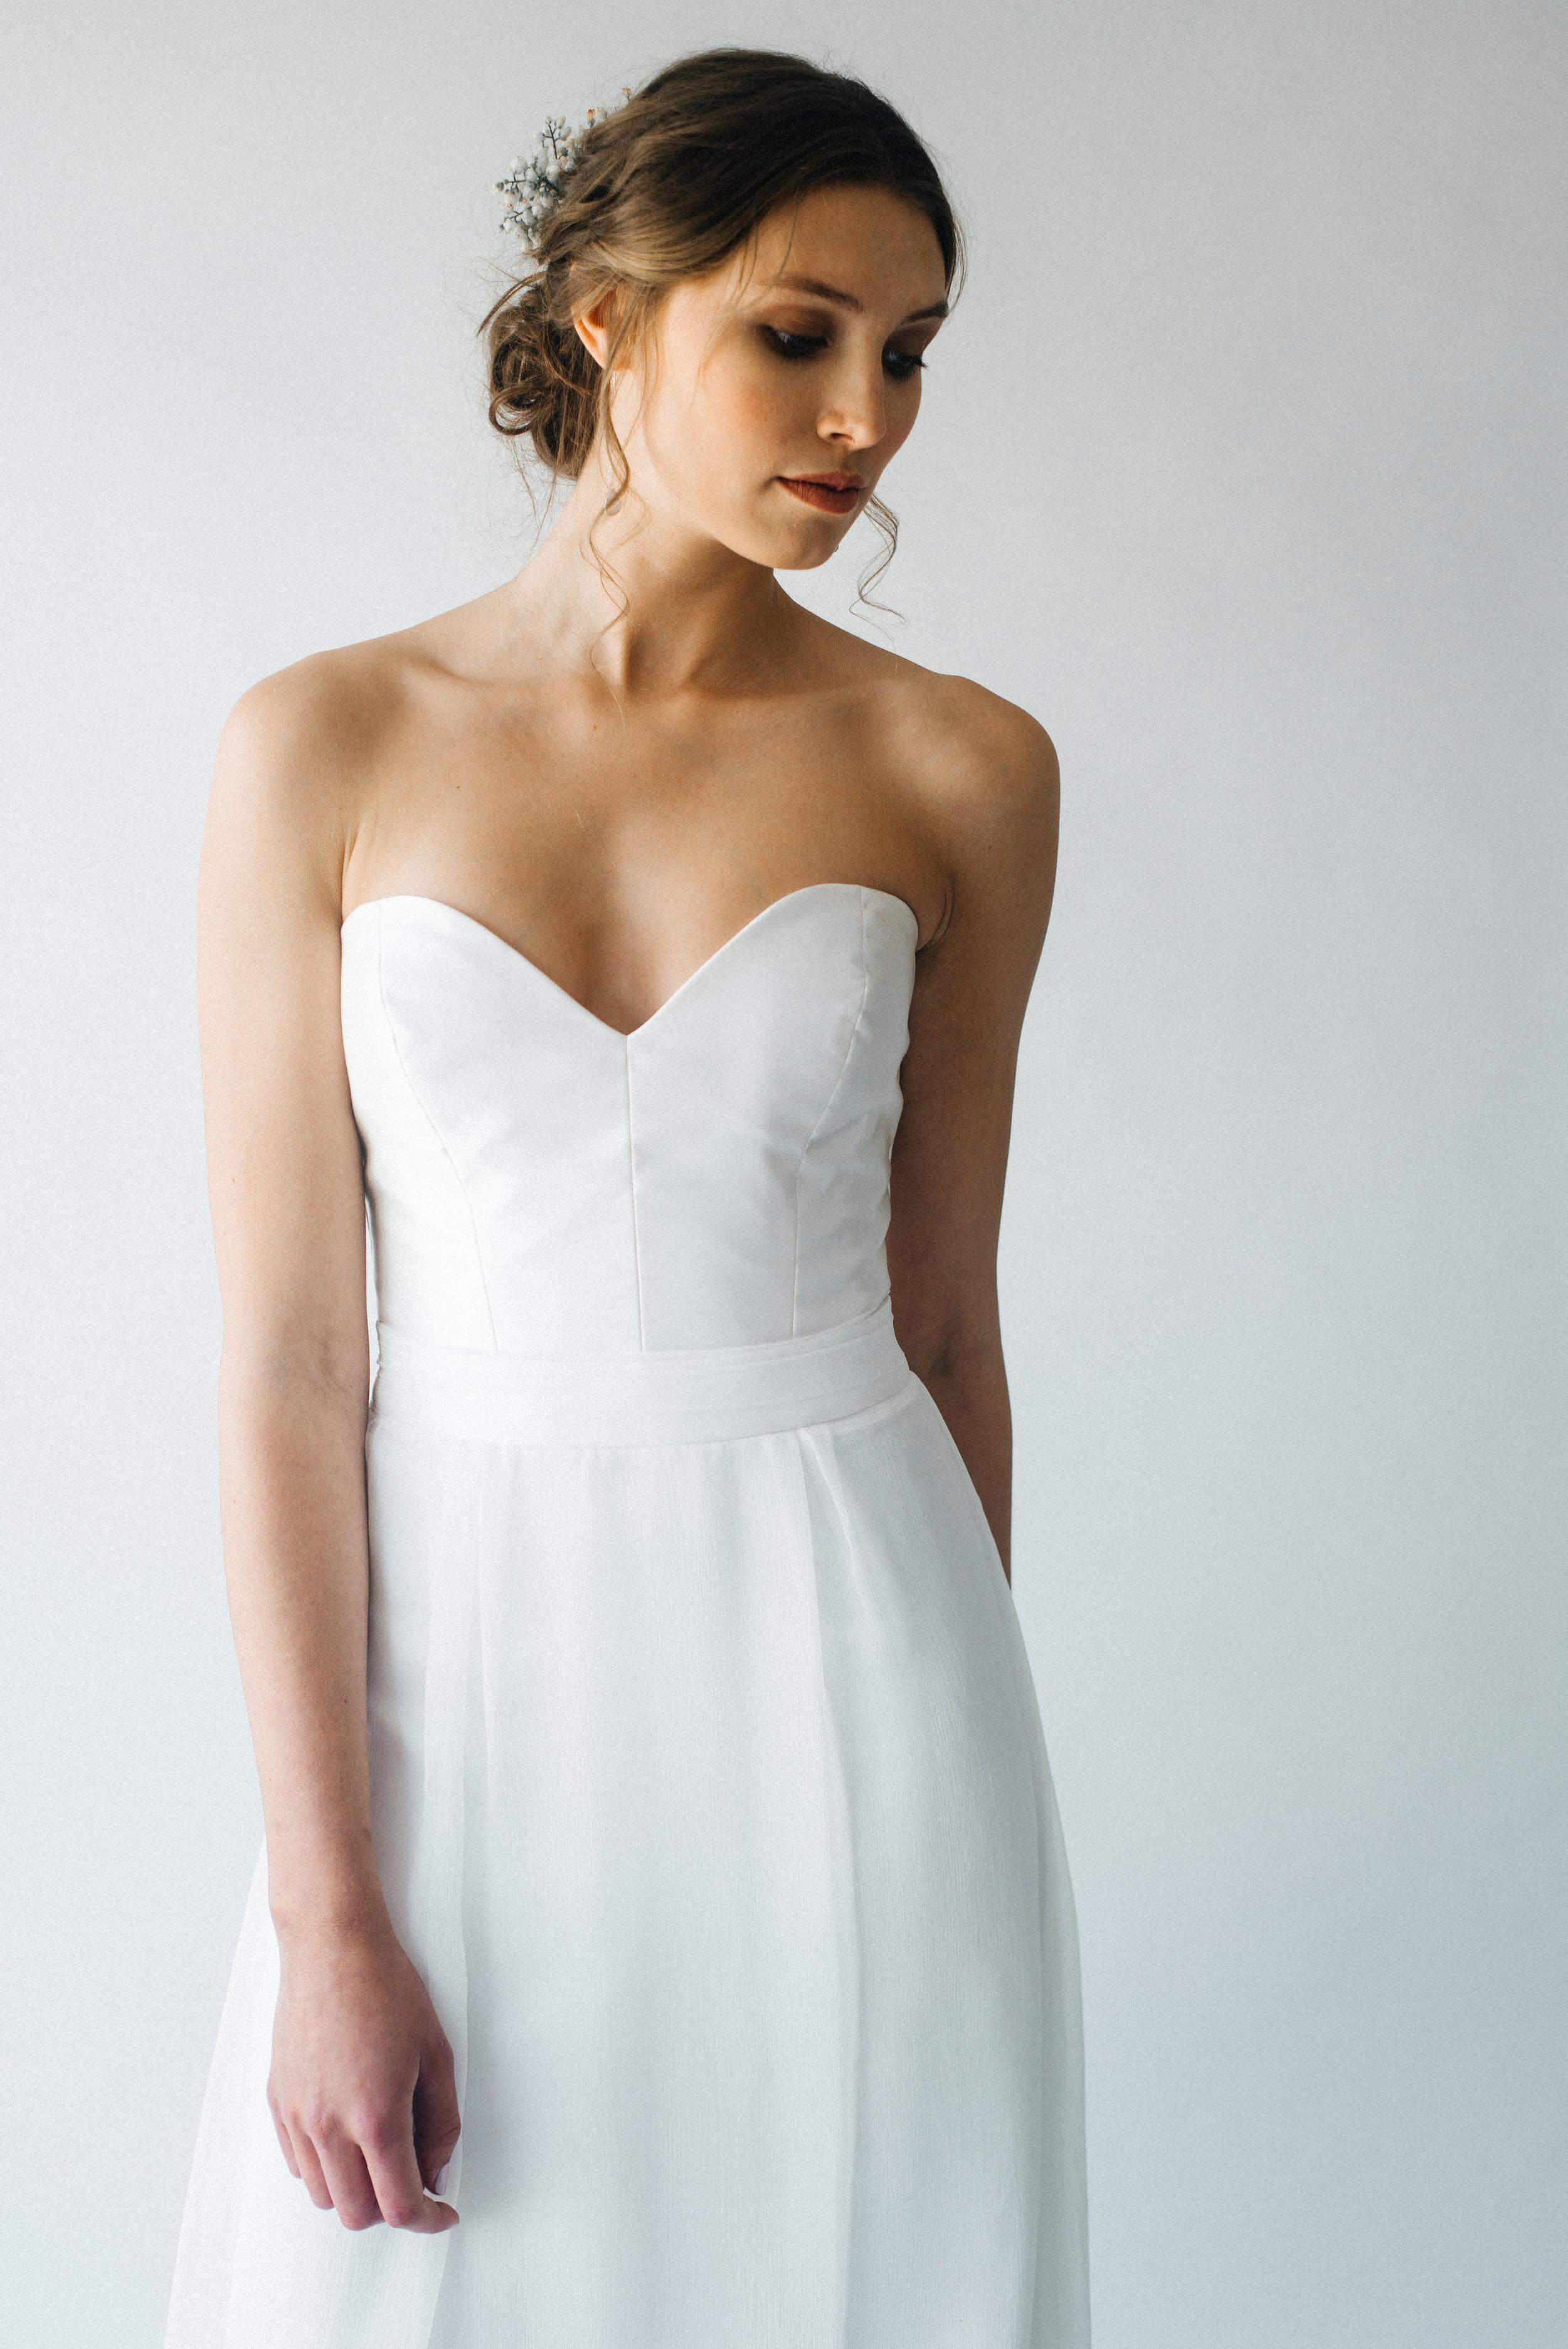 Strapless wedding dress Falmouth.jpg